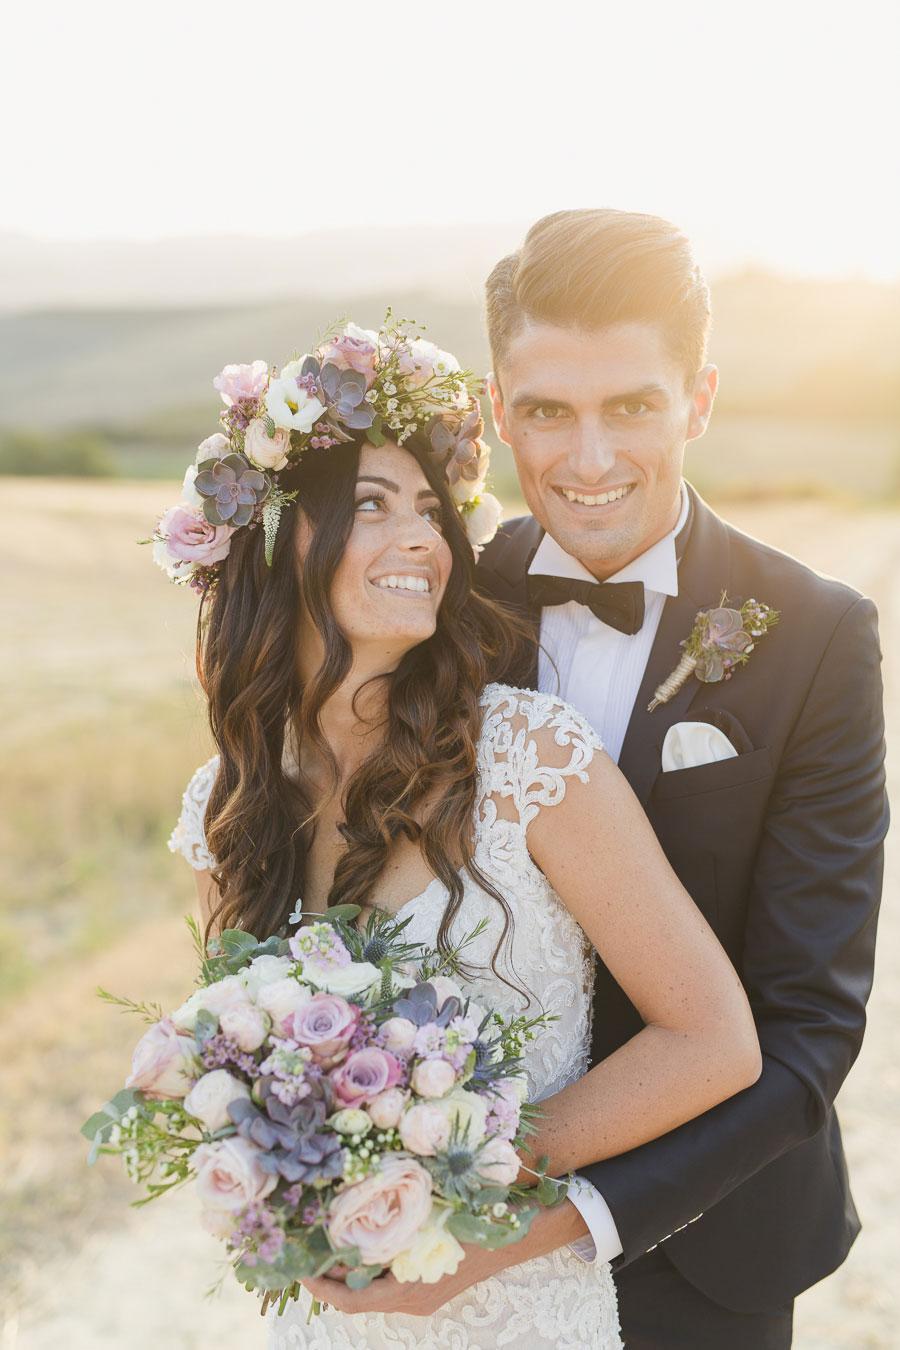 Wedding-Nicholad-and-Federica-Giuseppe-Giovannelli-179